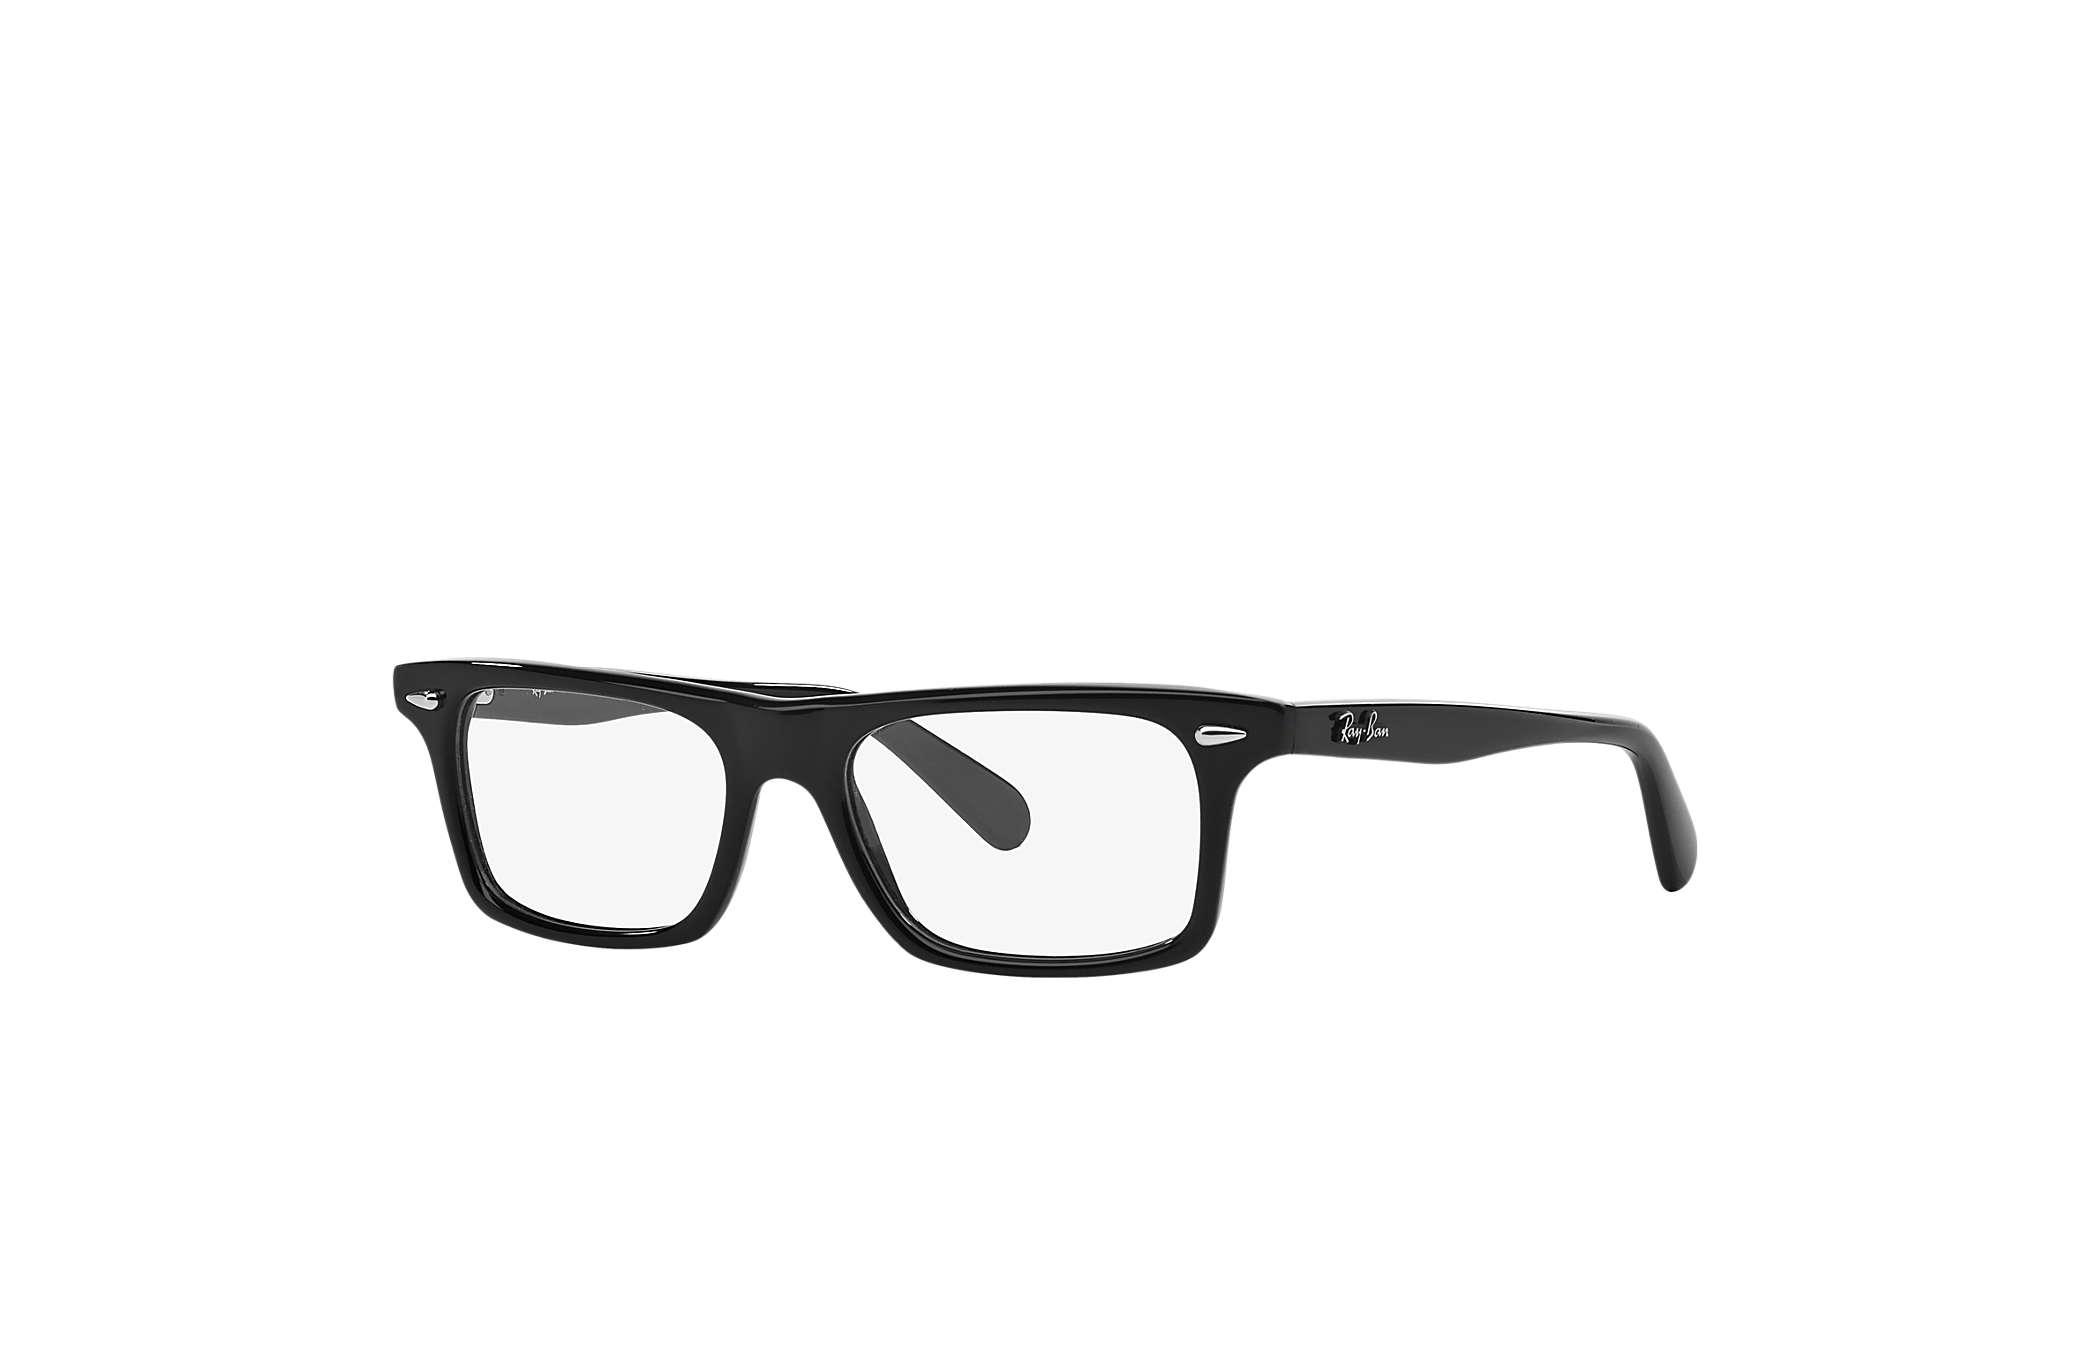 eyeglasses ray ban  Rectangular Shape Eyeglasses